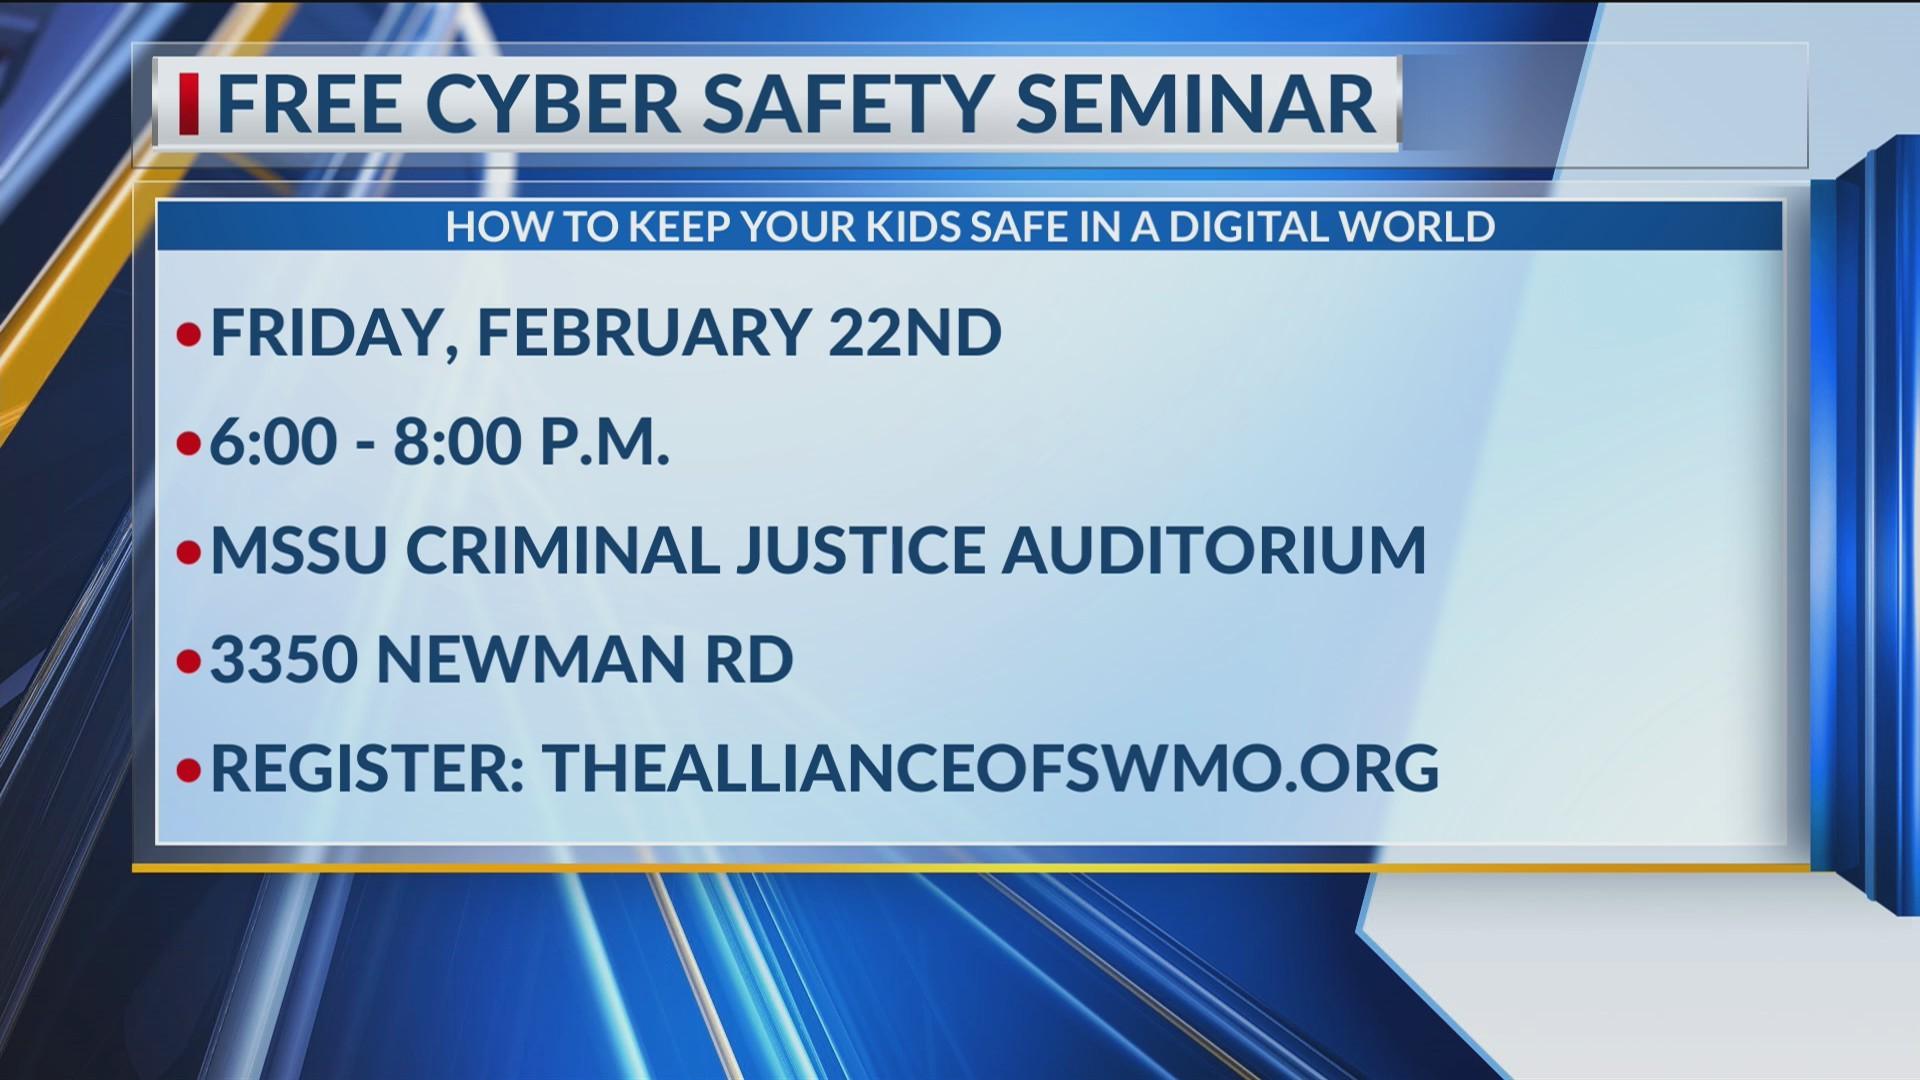 Free Cyber Safety Seminar